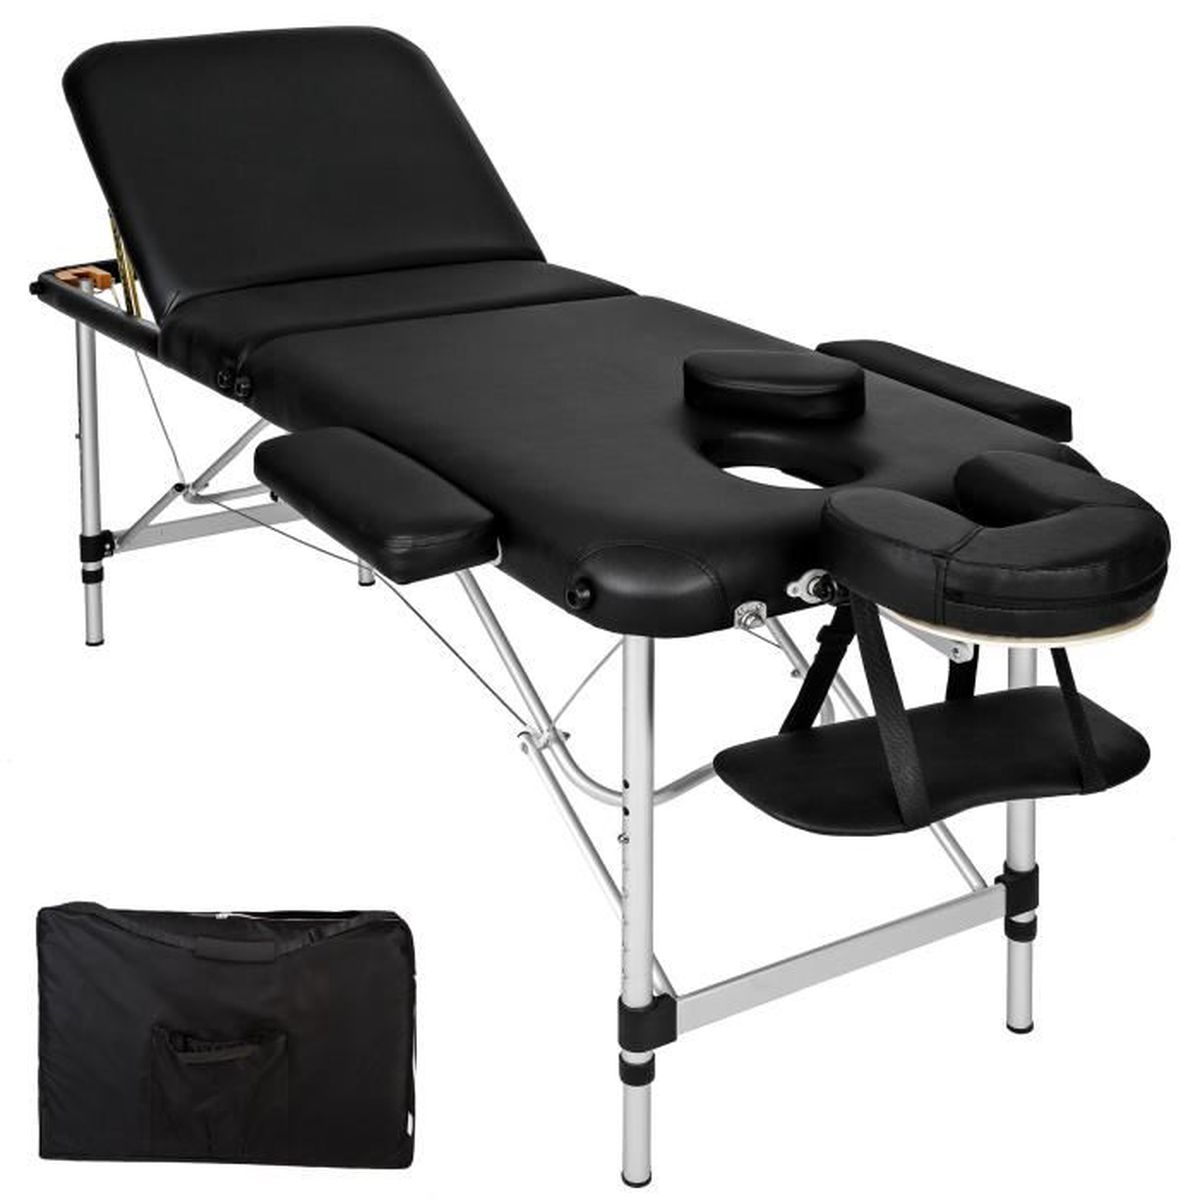 Tectake Table De Massage Pliante Bois 3 Zones Cadre En Aluminium